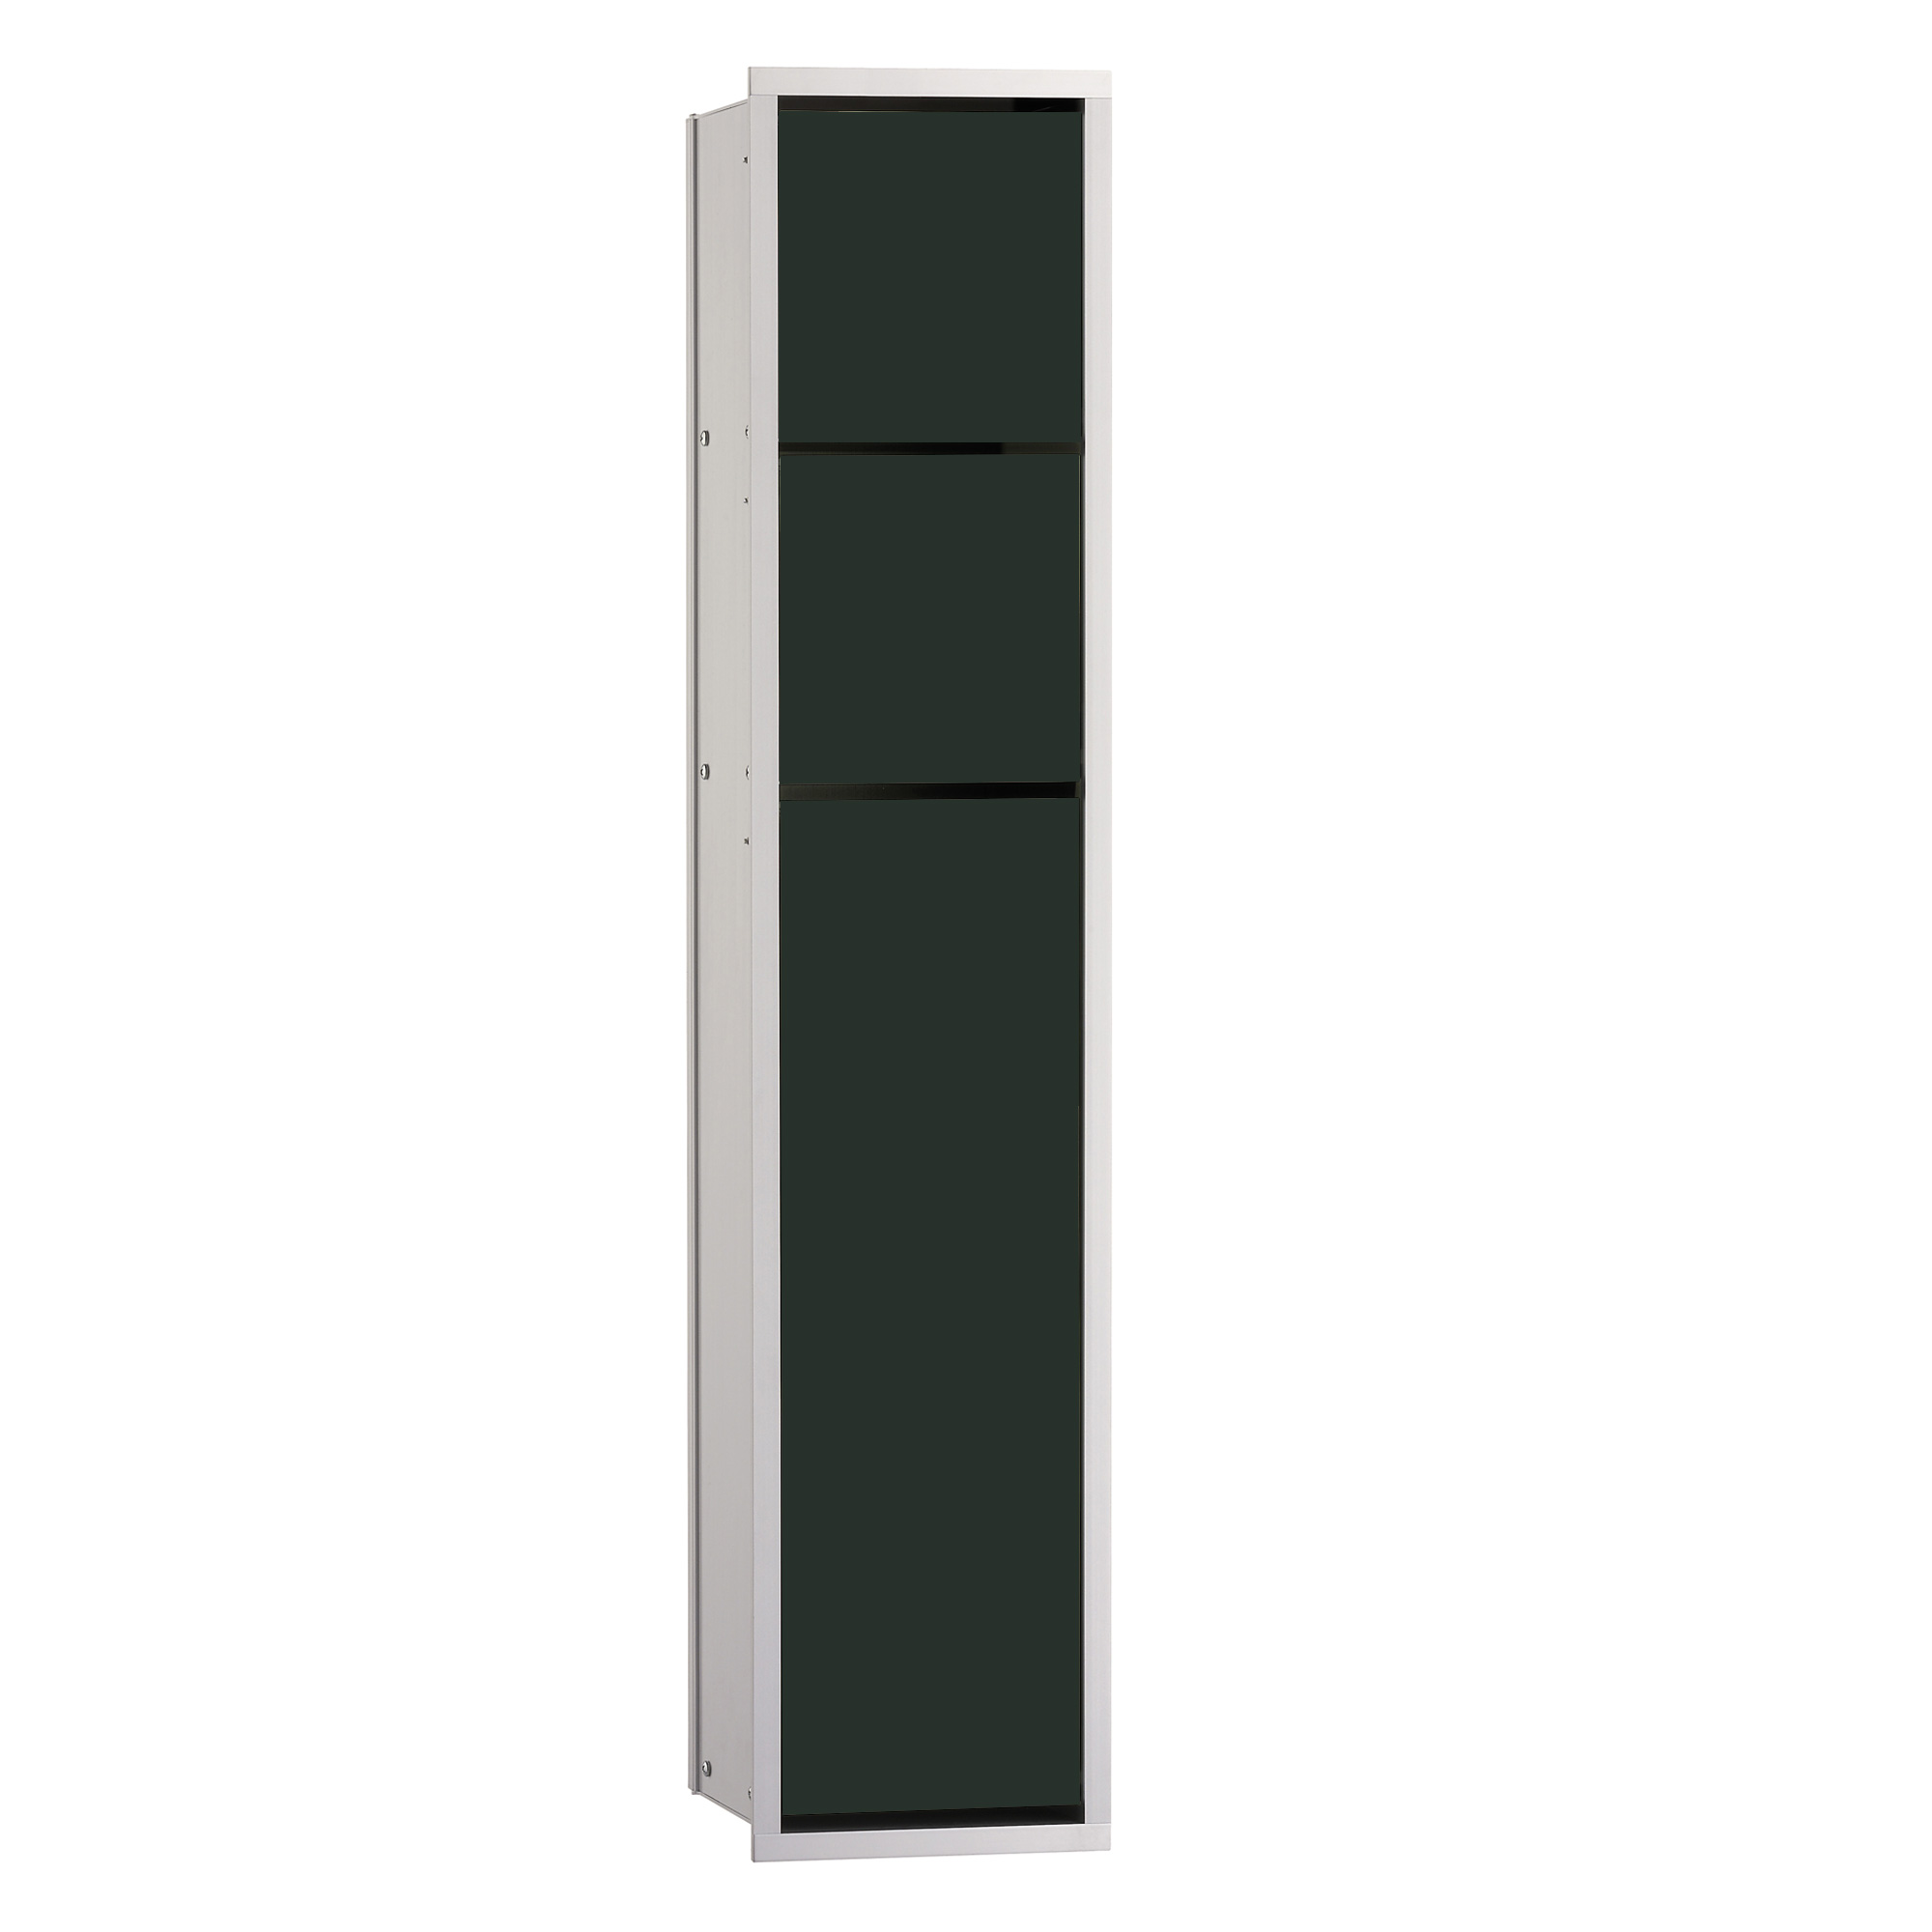 emco asis unterputz wc modul schwarz aluminium 975027550 reuter onlineshop. Black Bedroom Furniture Sets. Home Design Ideas